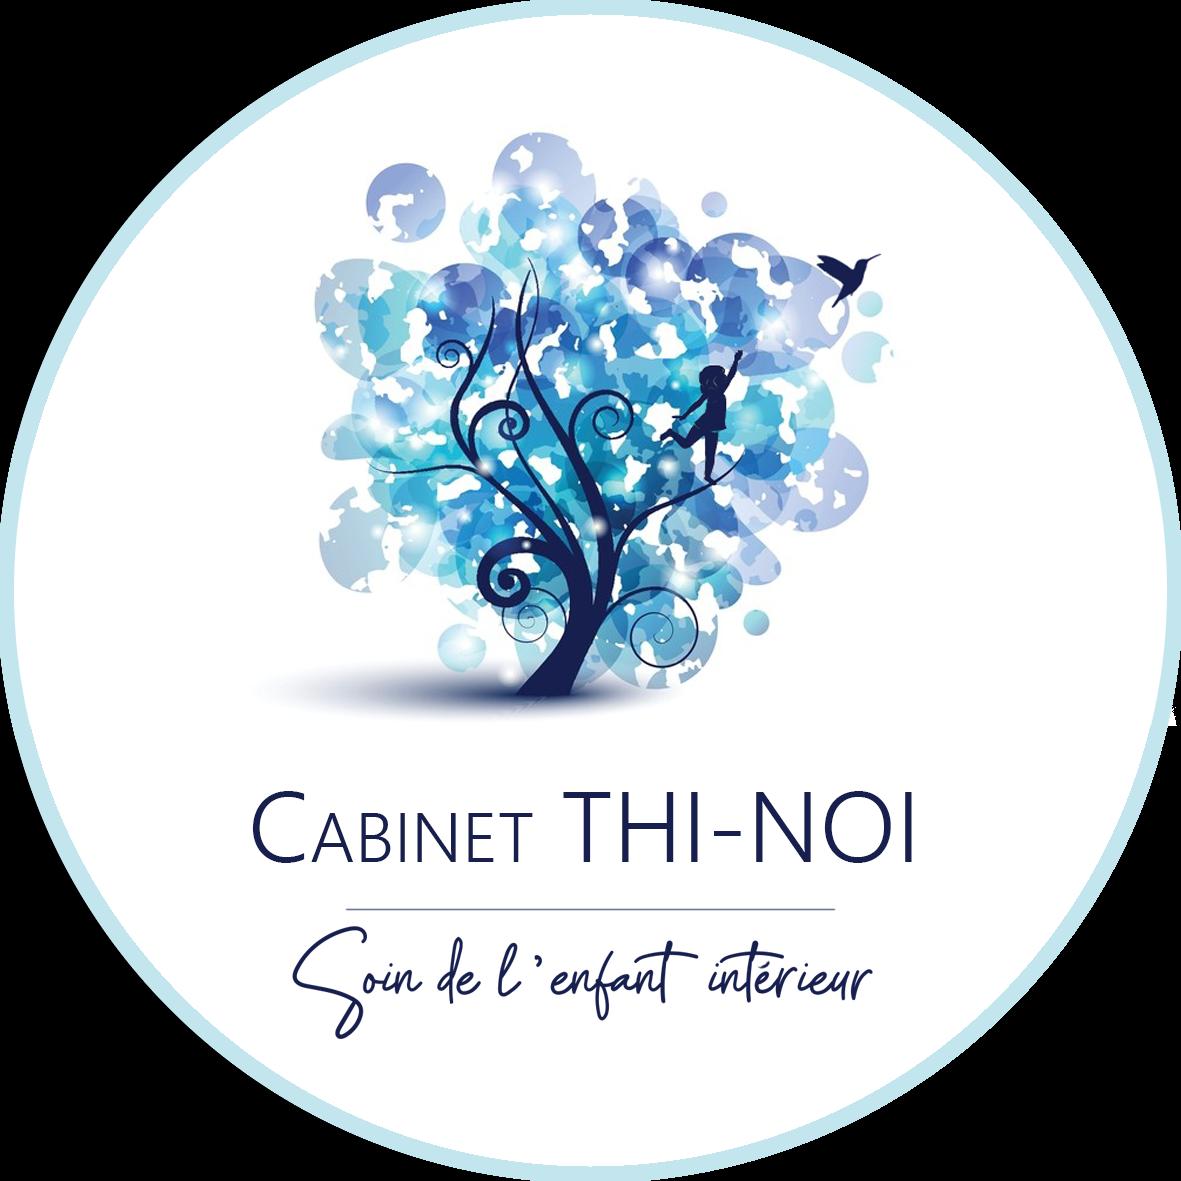 Cabinet Thi-Noï